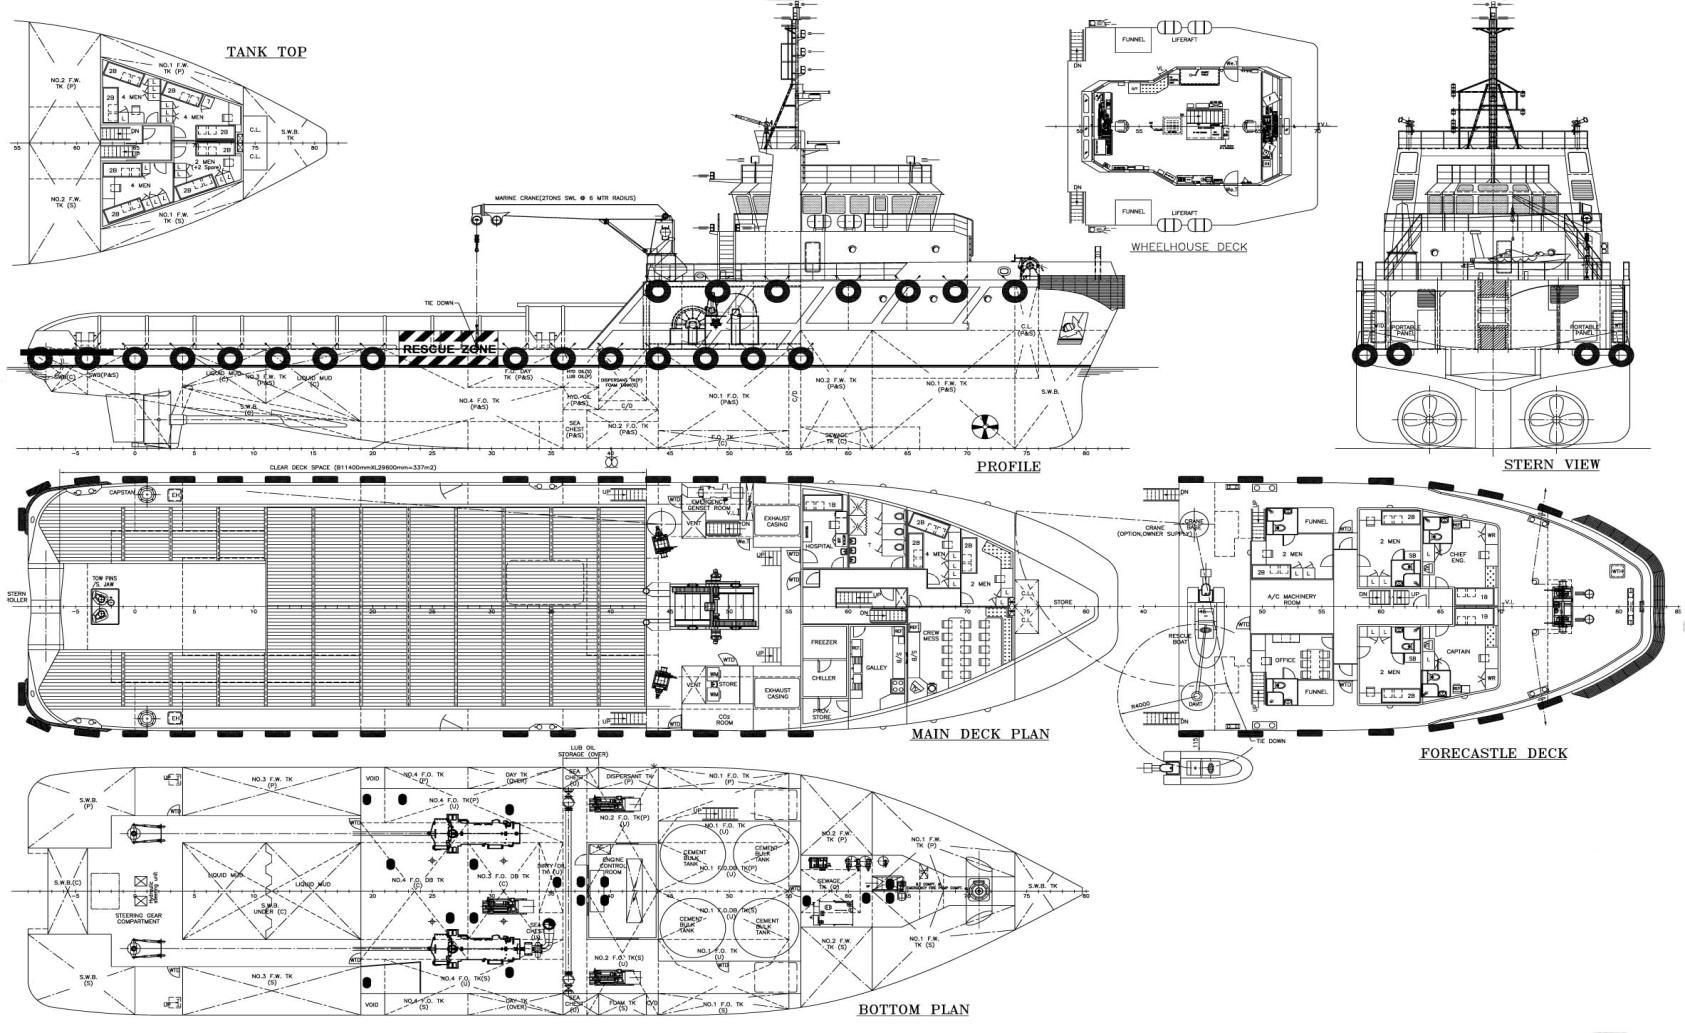 wiring balboa diagram 2000p3